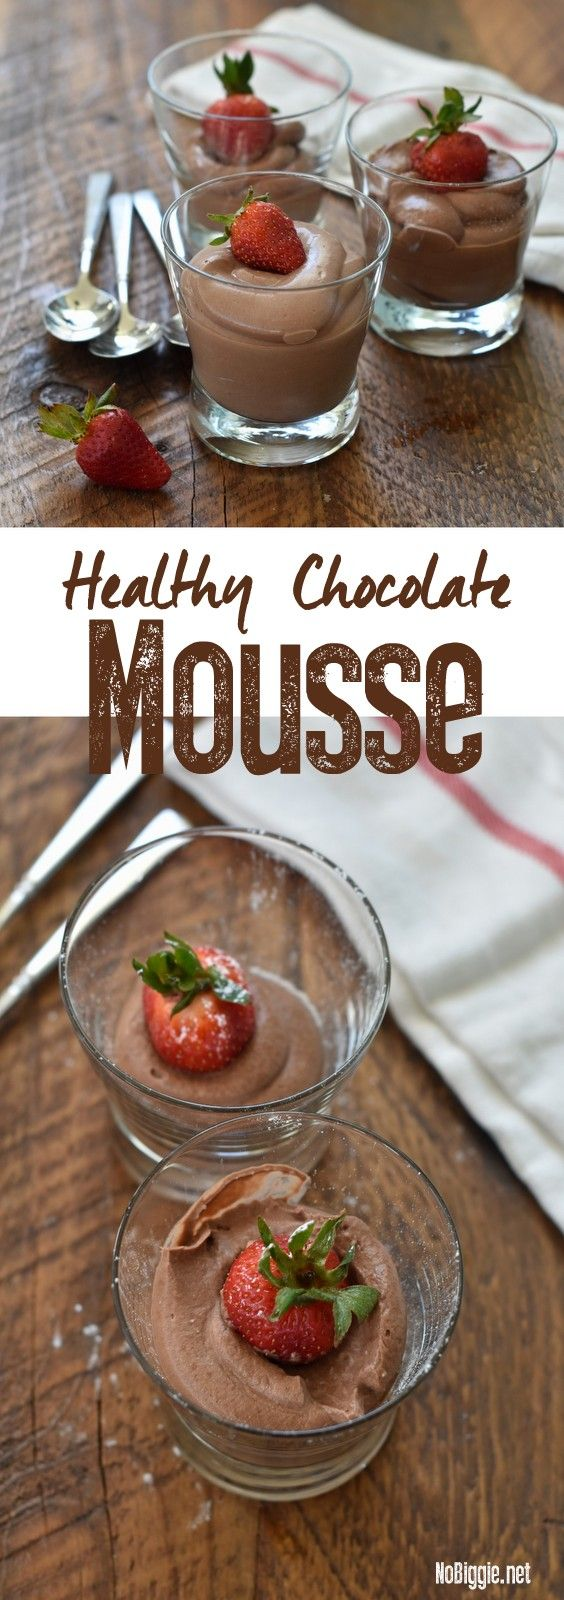 three ingredient healthy chocolate mousse video | NoBiggie.net